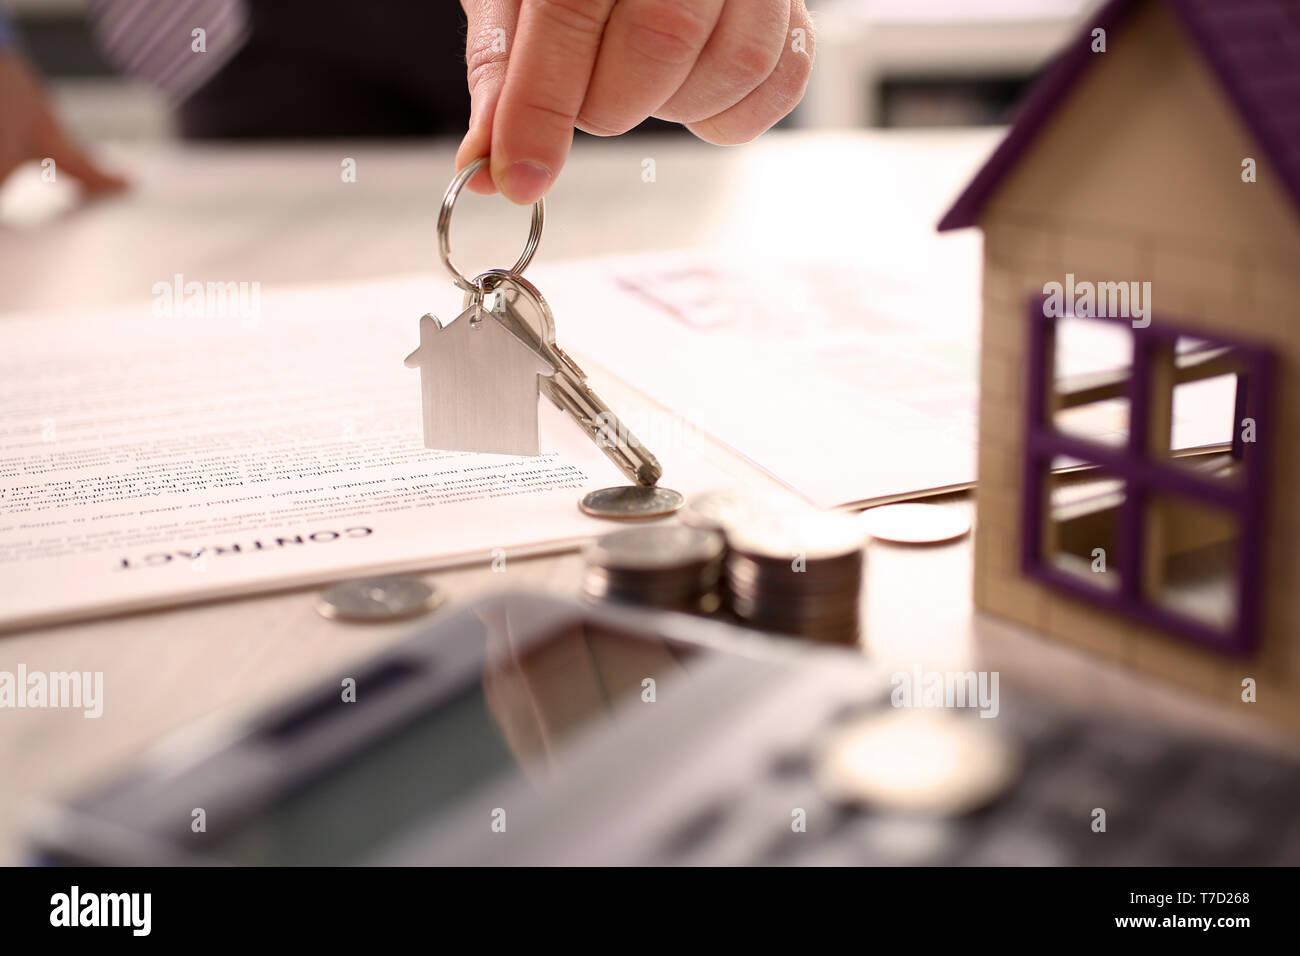 Home Real Estate Property Handover Sale Concept - Stock Image